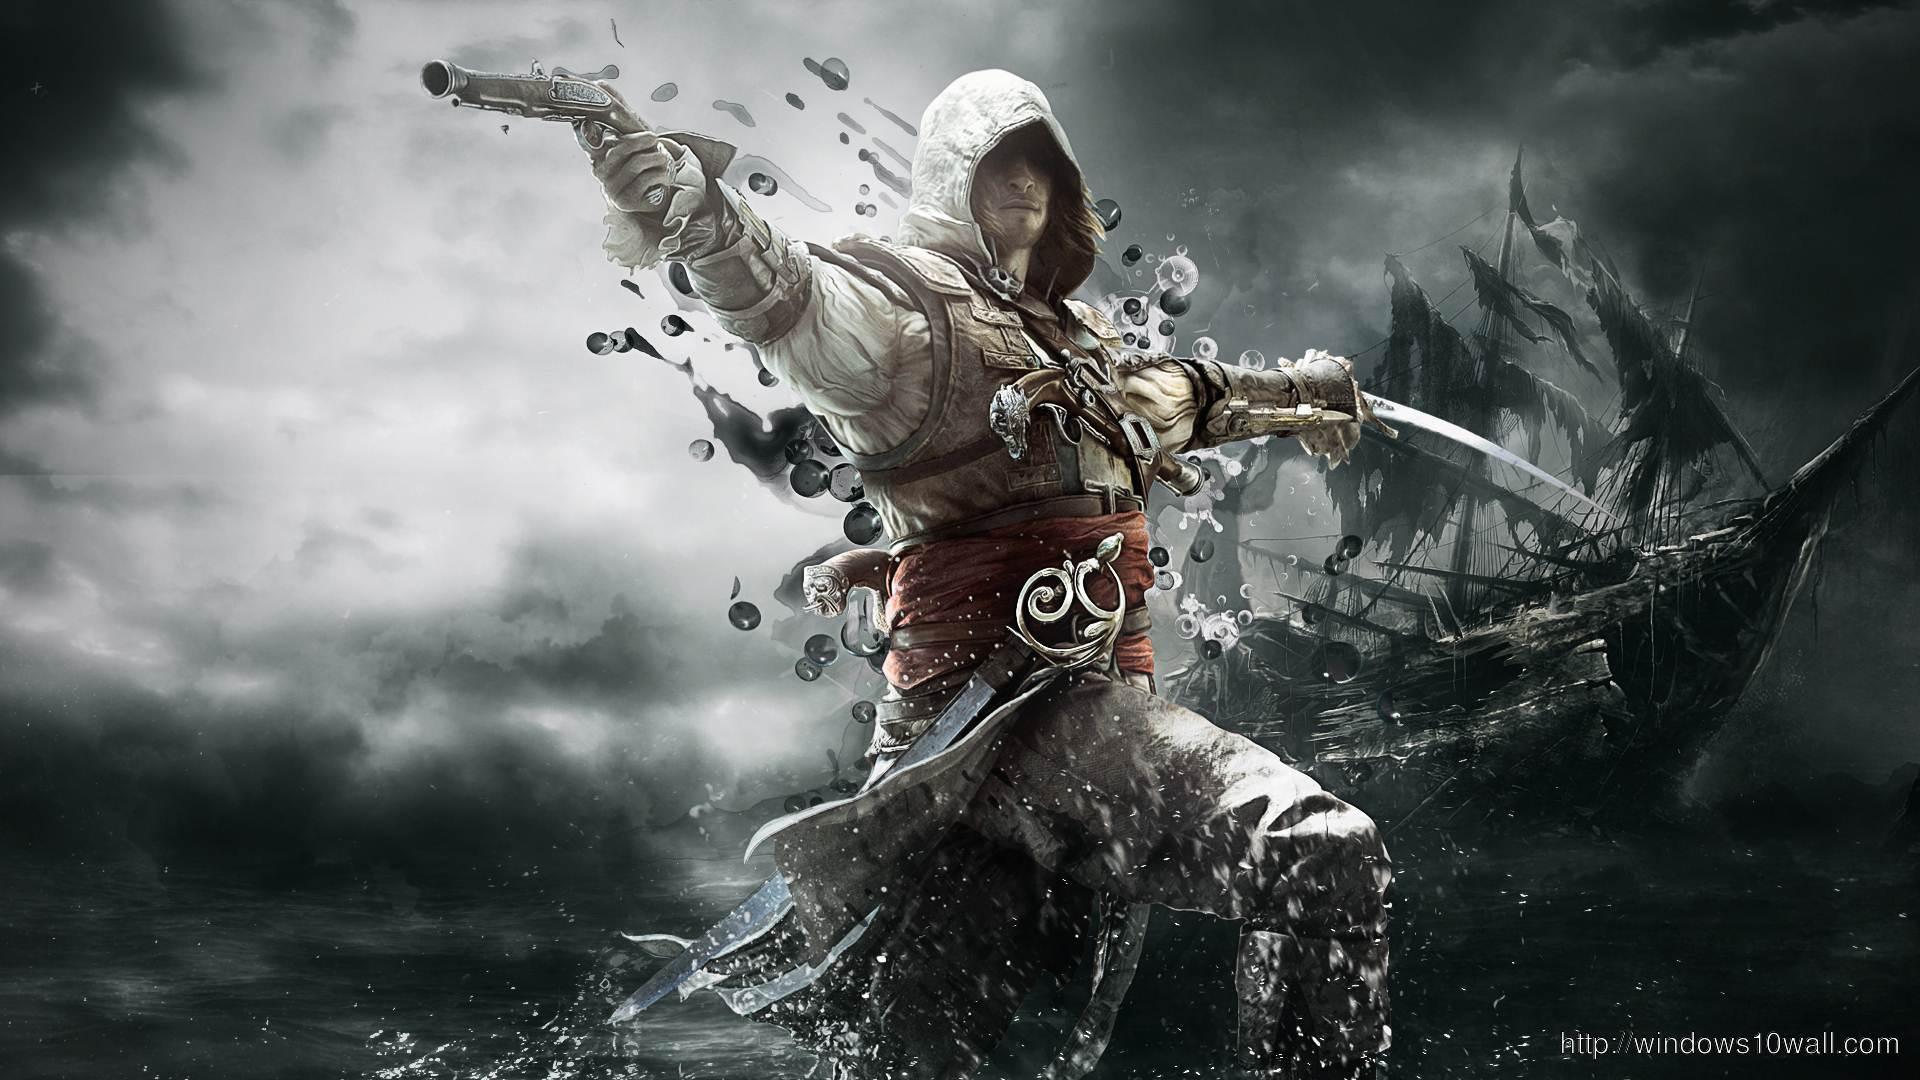 Assassin creed 4 jack wallpaper